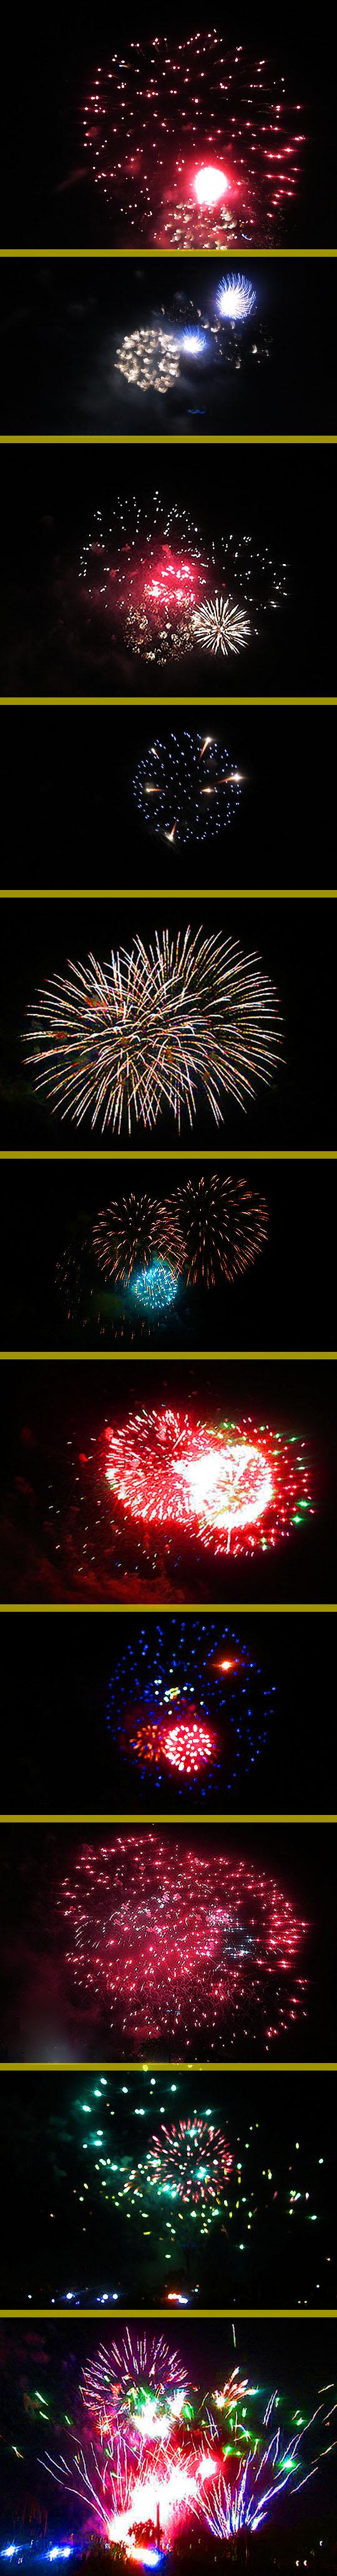 11. fireworksblazing_7-8-19.jpg